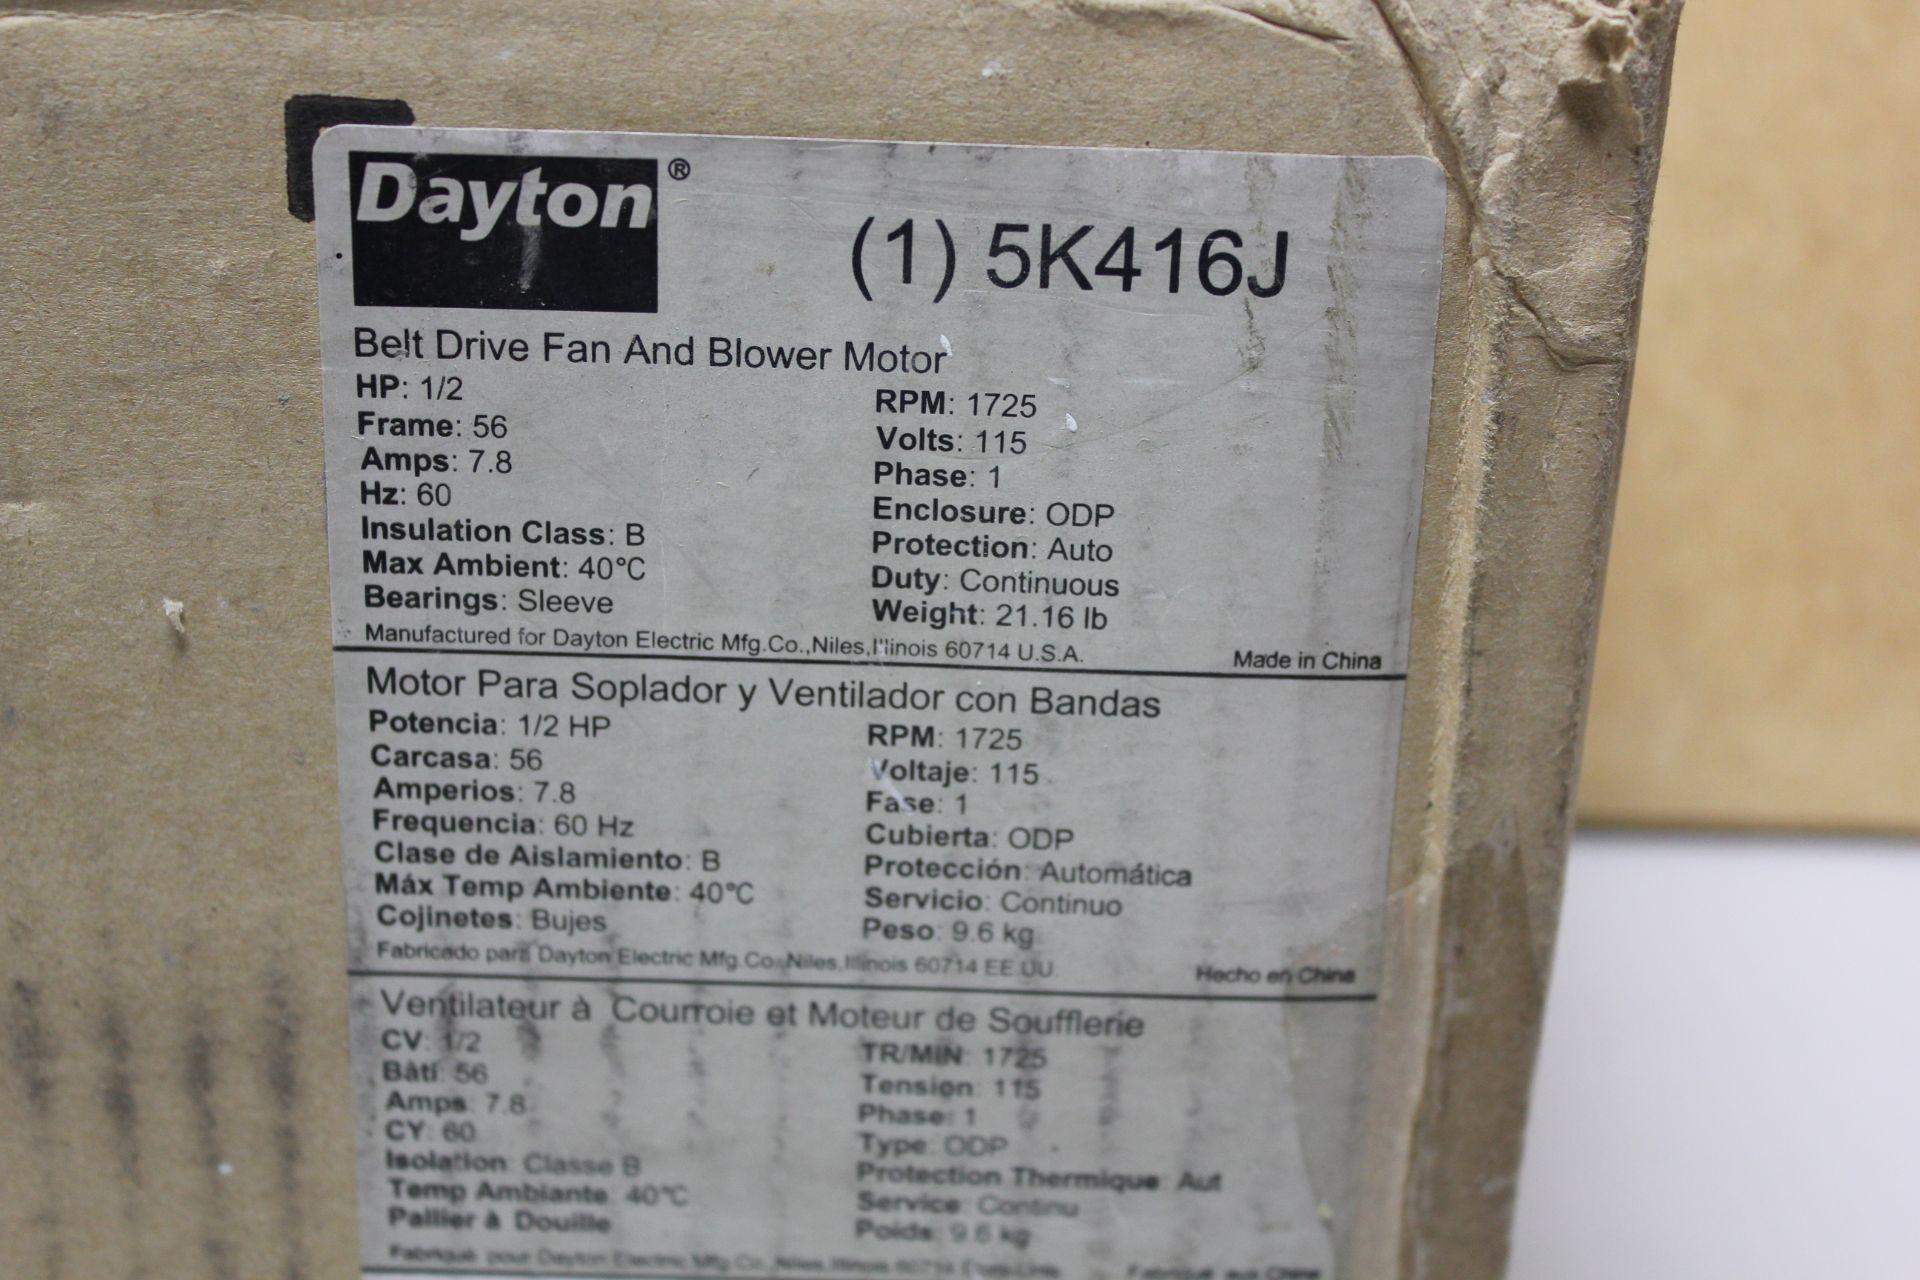 Lot 653 - NEW DAYTON BELT DRIVE FAN AND BLOWER MOTOR